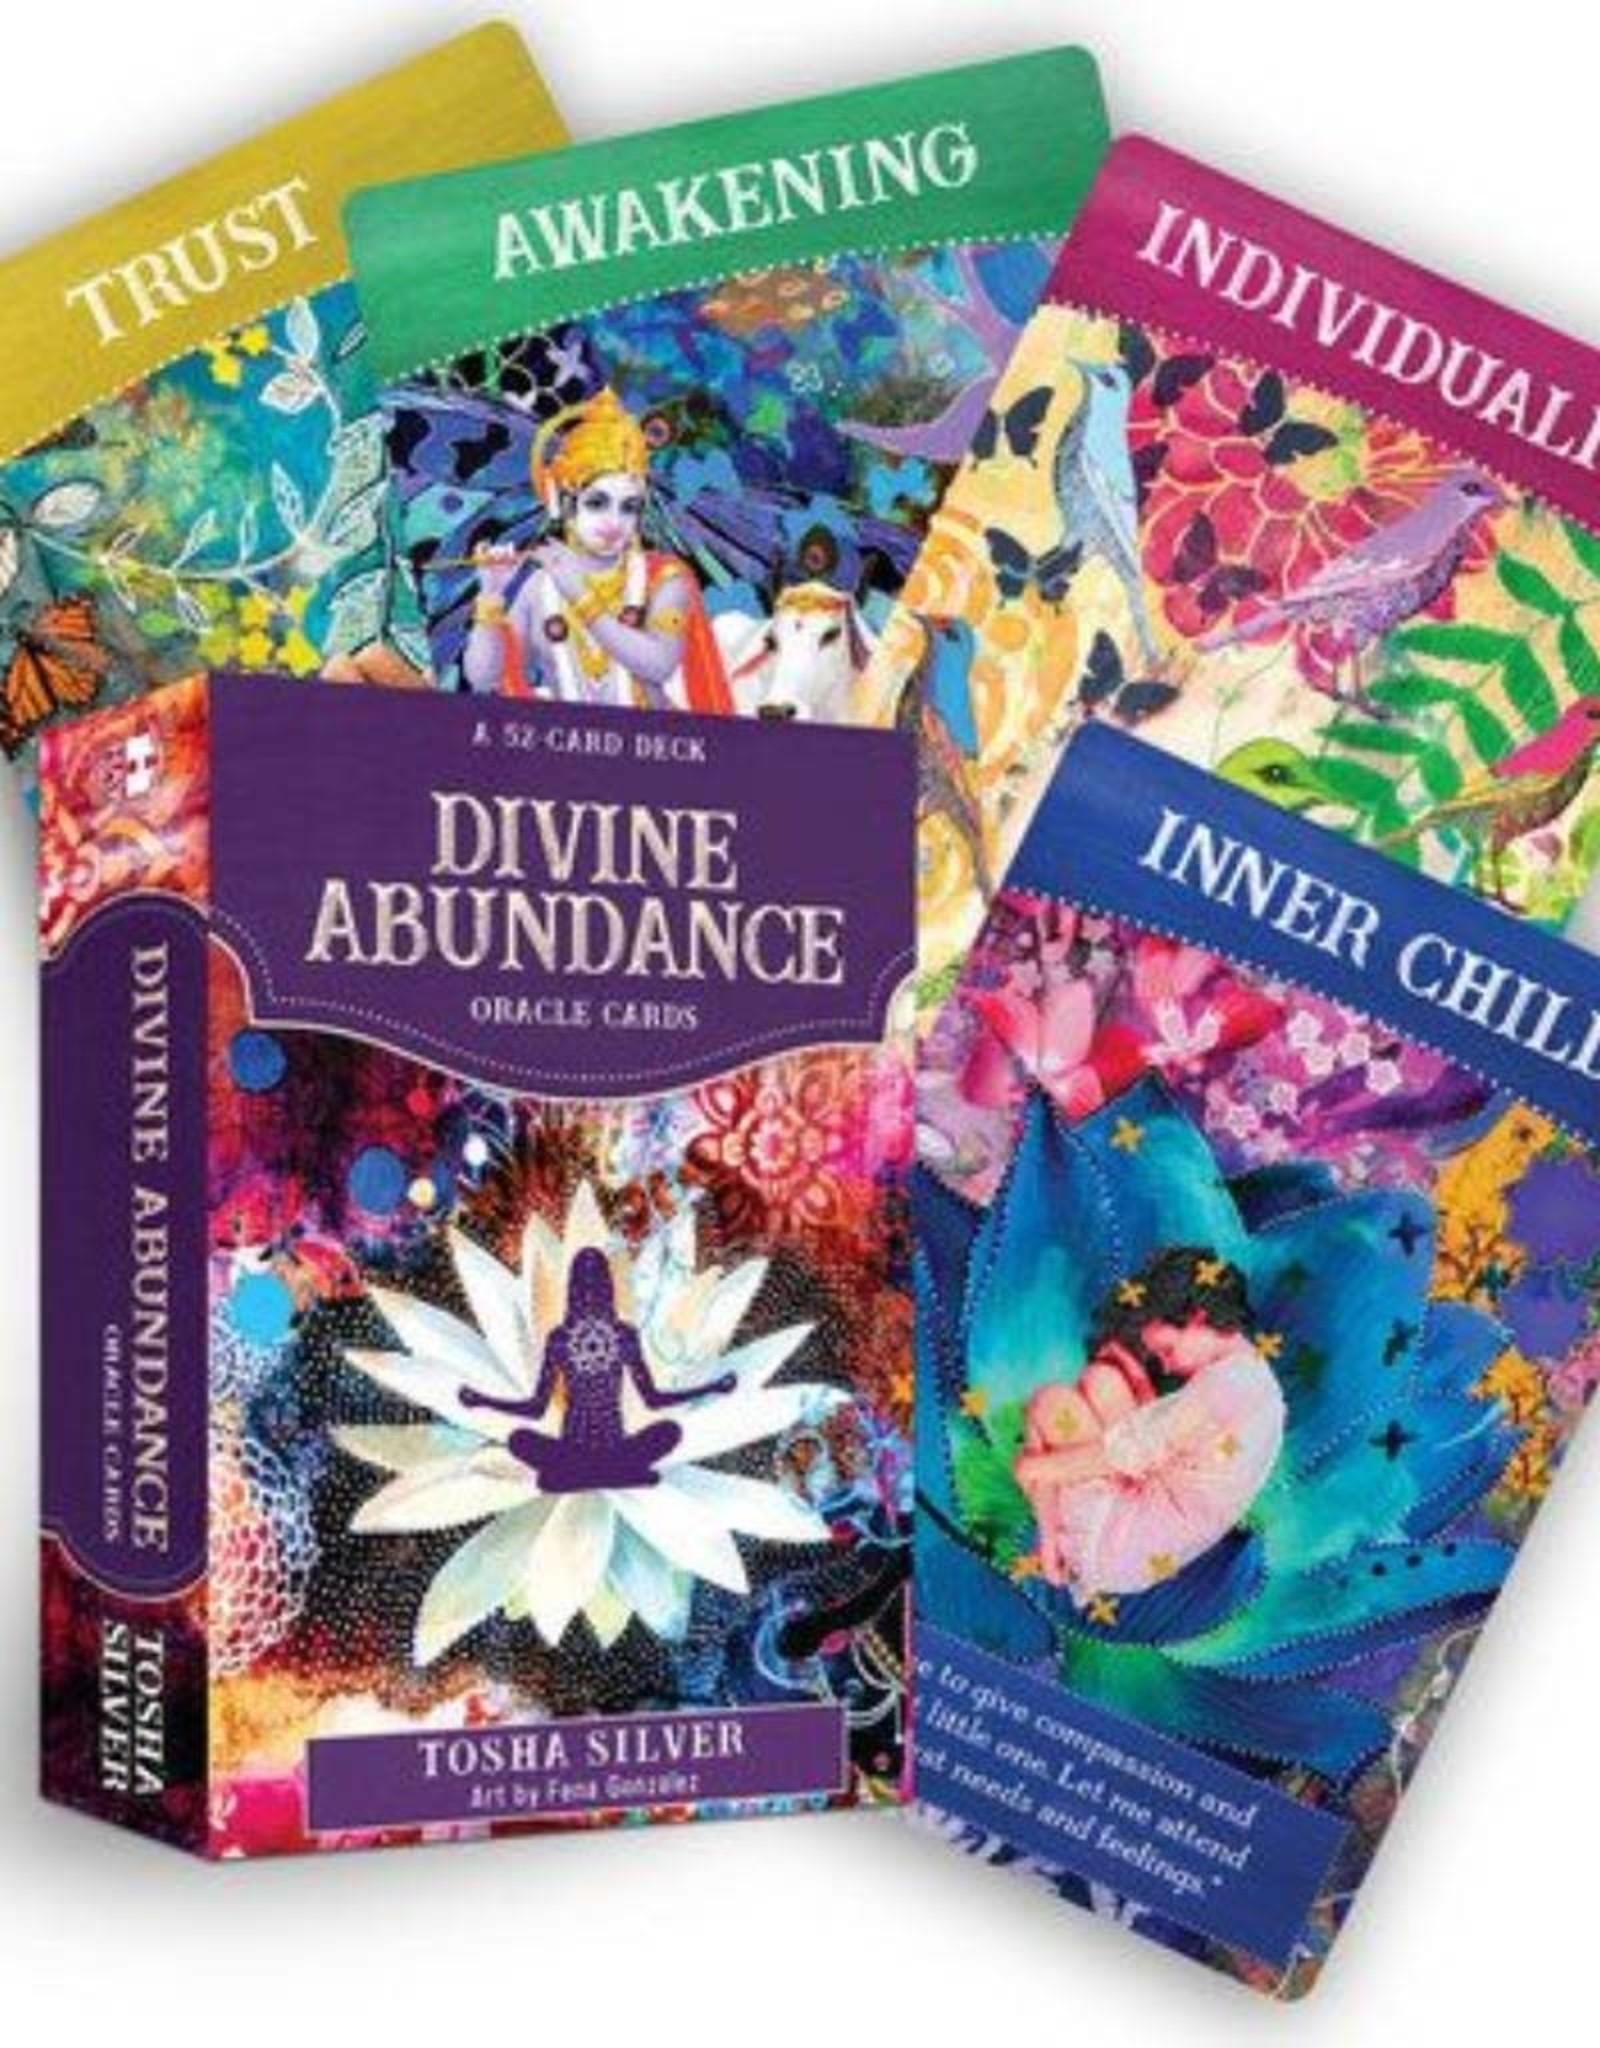 Tosha Silver Divine Abundance Oracle Cards by Tosha Silver